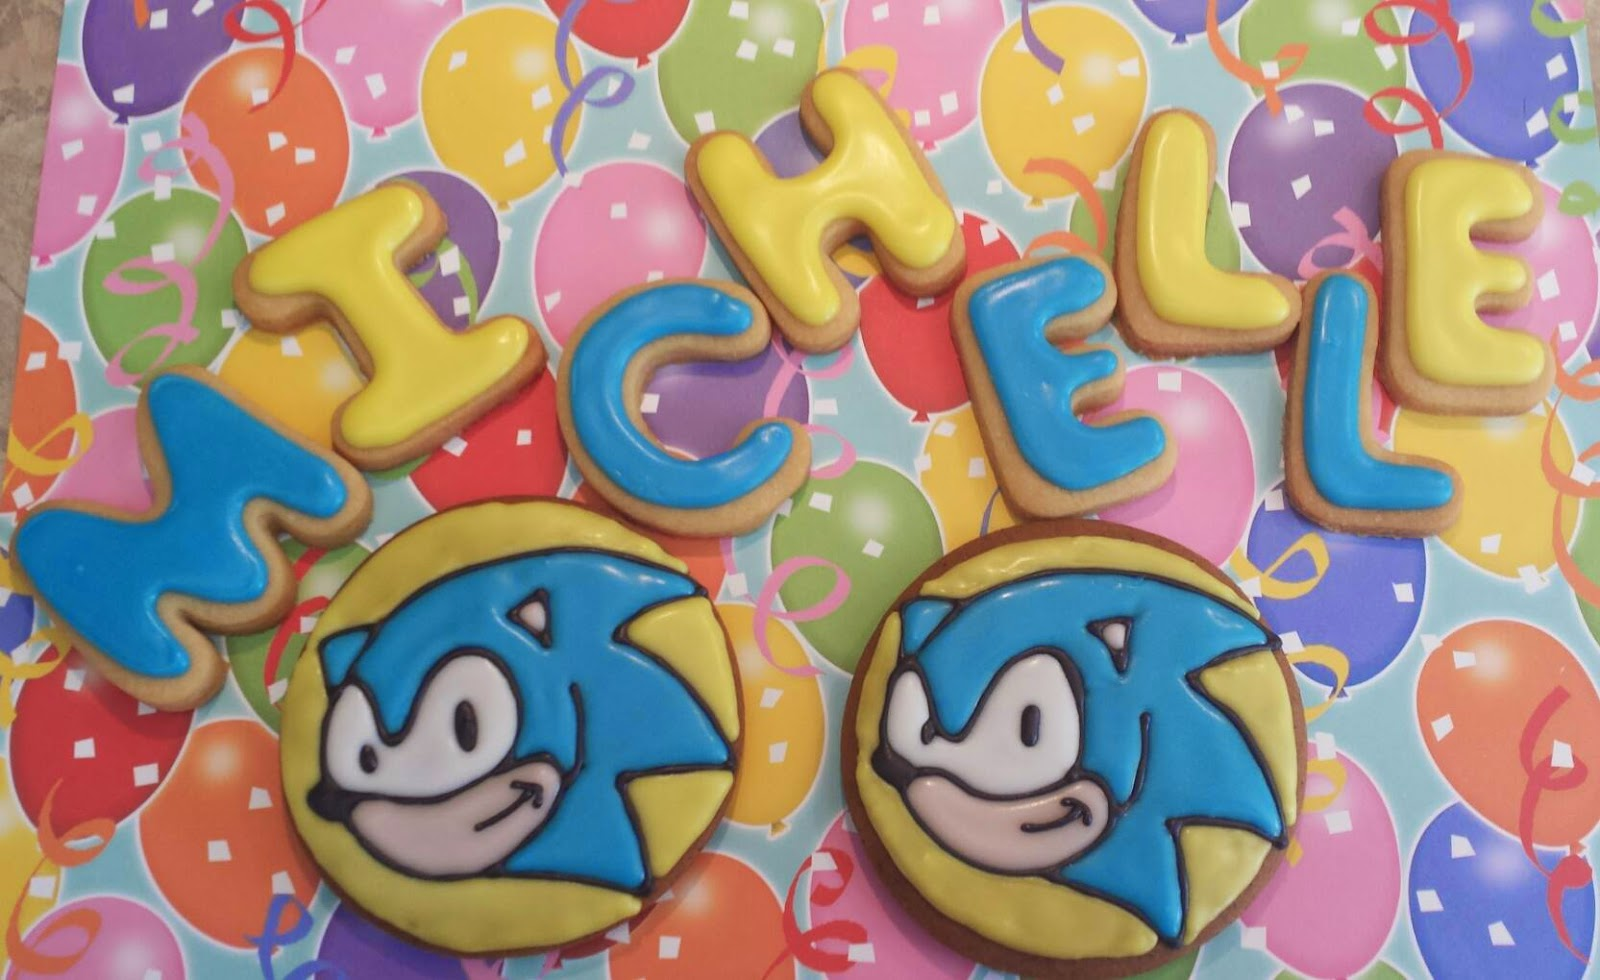 sonic the hedgehog cookies, sonic the hedgehog